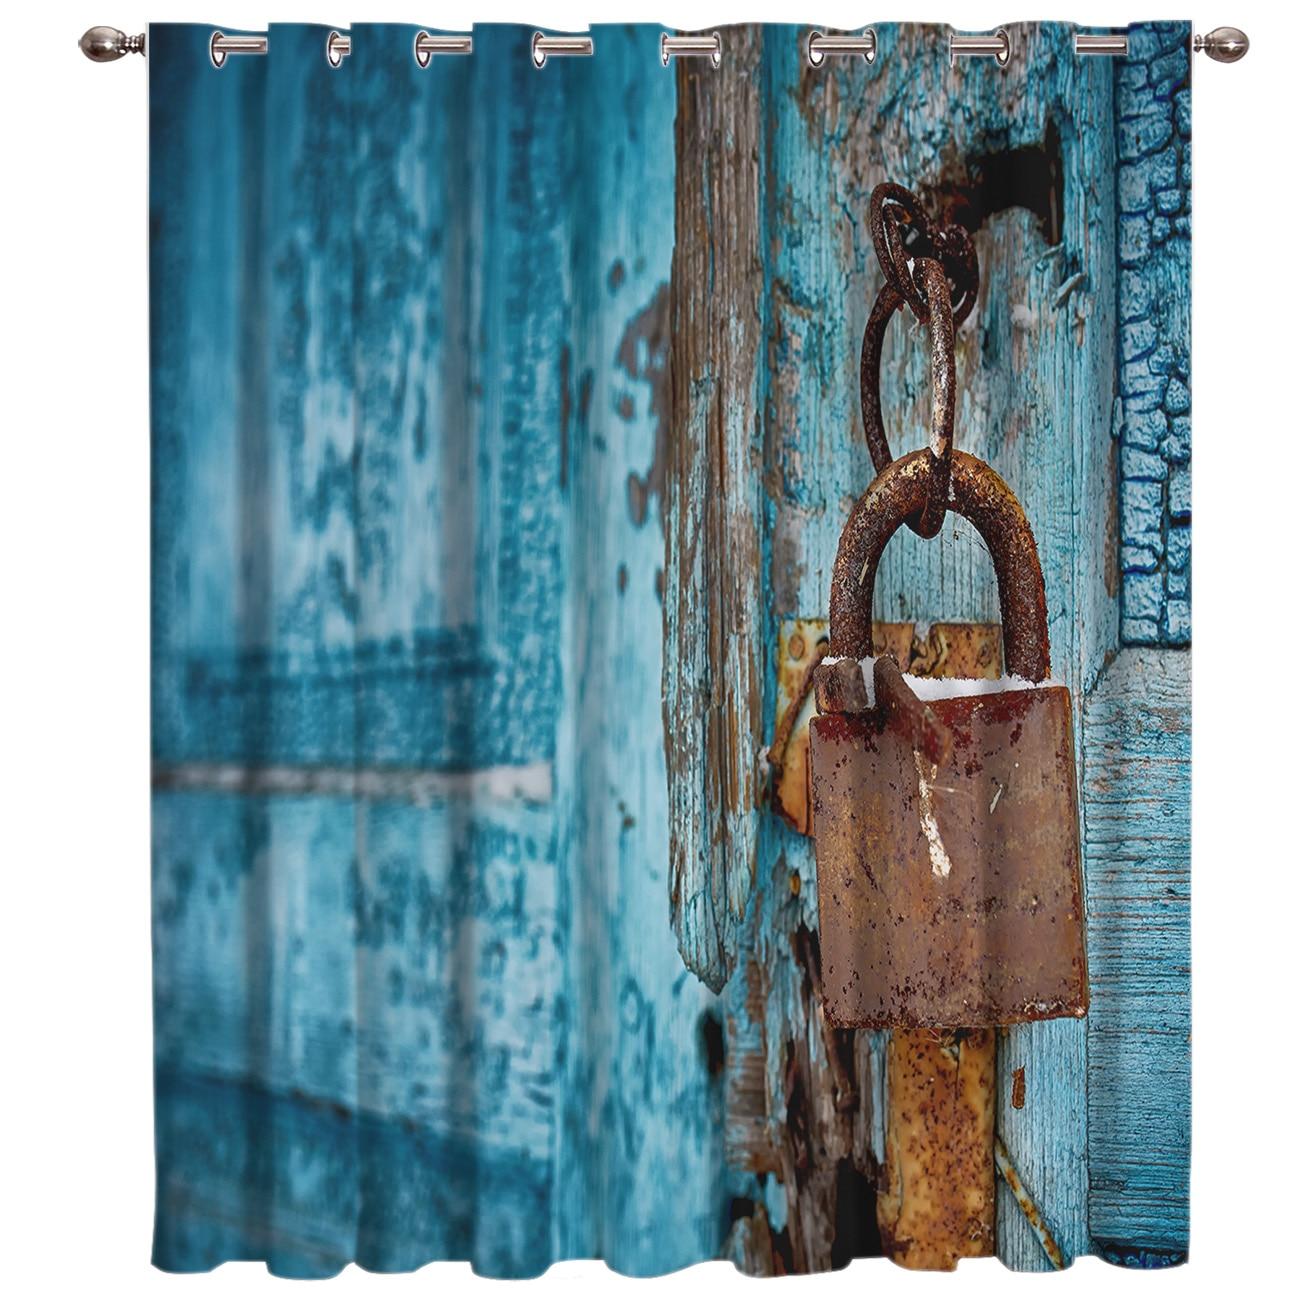 Old Door Lock Window Treatments Curtains Valance Bathroom Outdoor Indoor Decor Kids Window Curtain Panels Curtains And Drapes